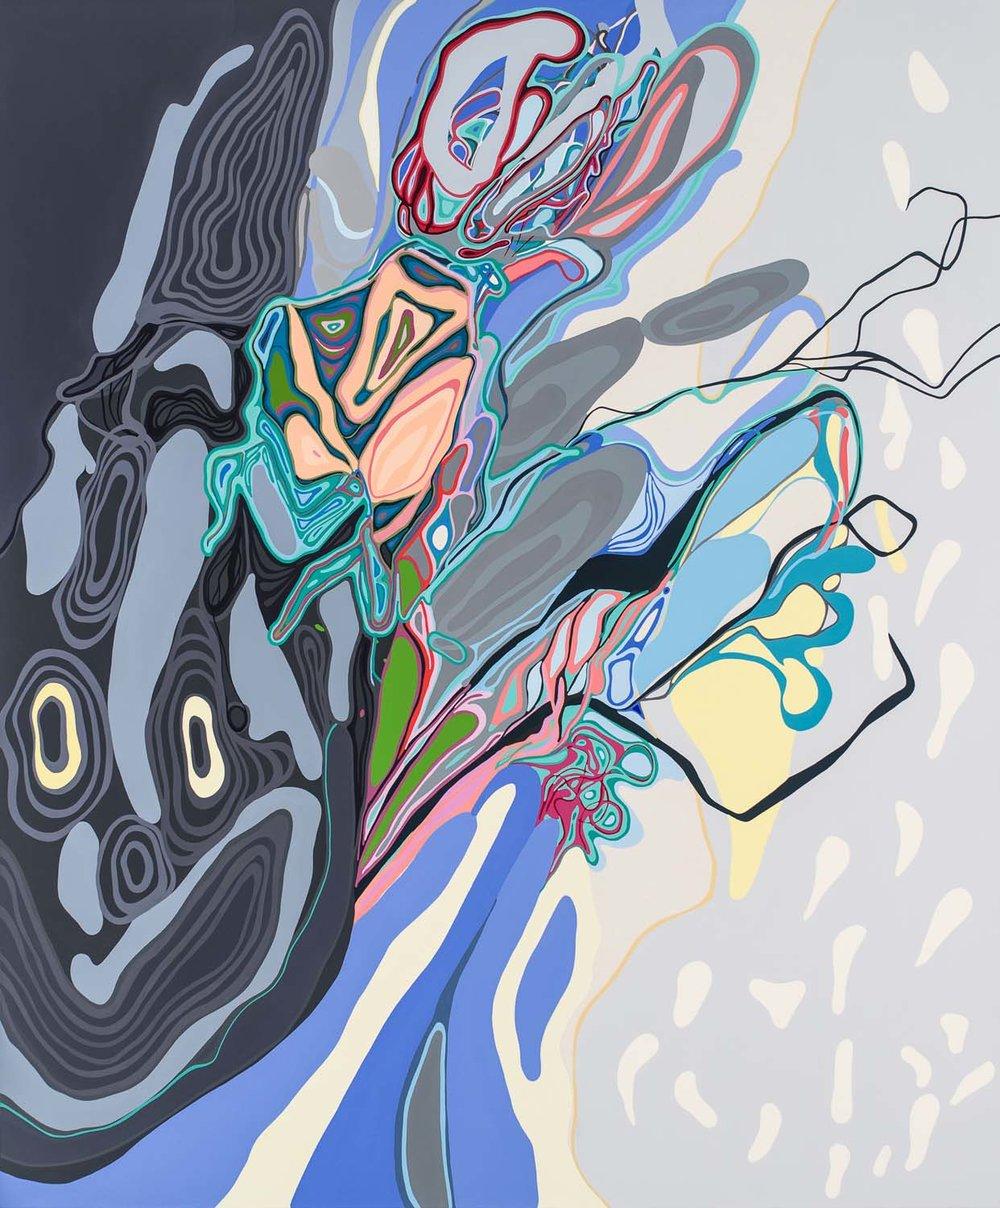 atropine ulnas , 2016 acrylic on canvas 70 x 60 inches